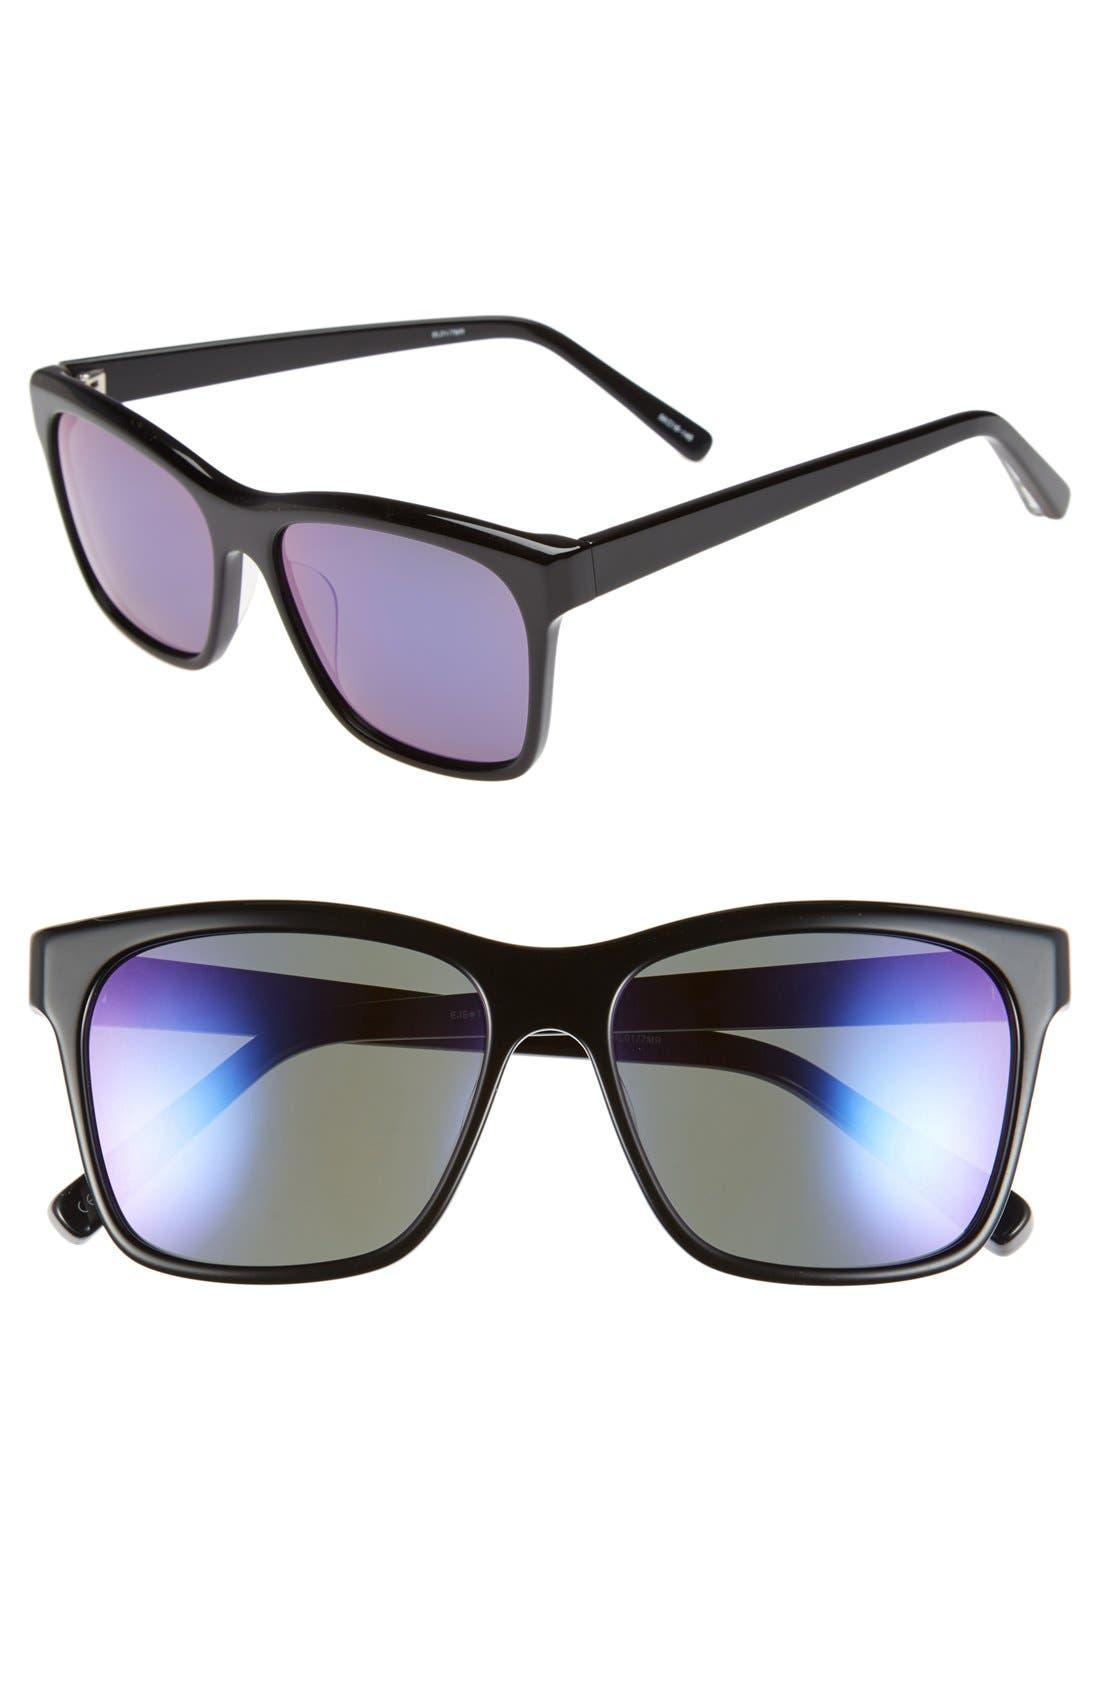 Main Image - Elizabeth and James 'Park' 56mm Sunglasses